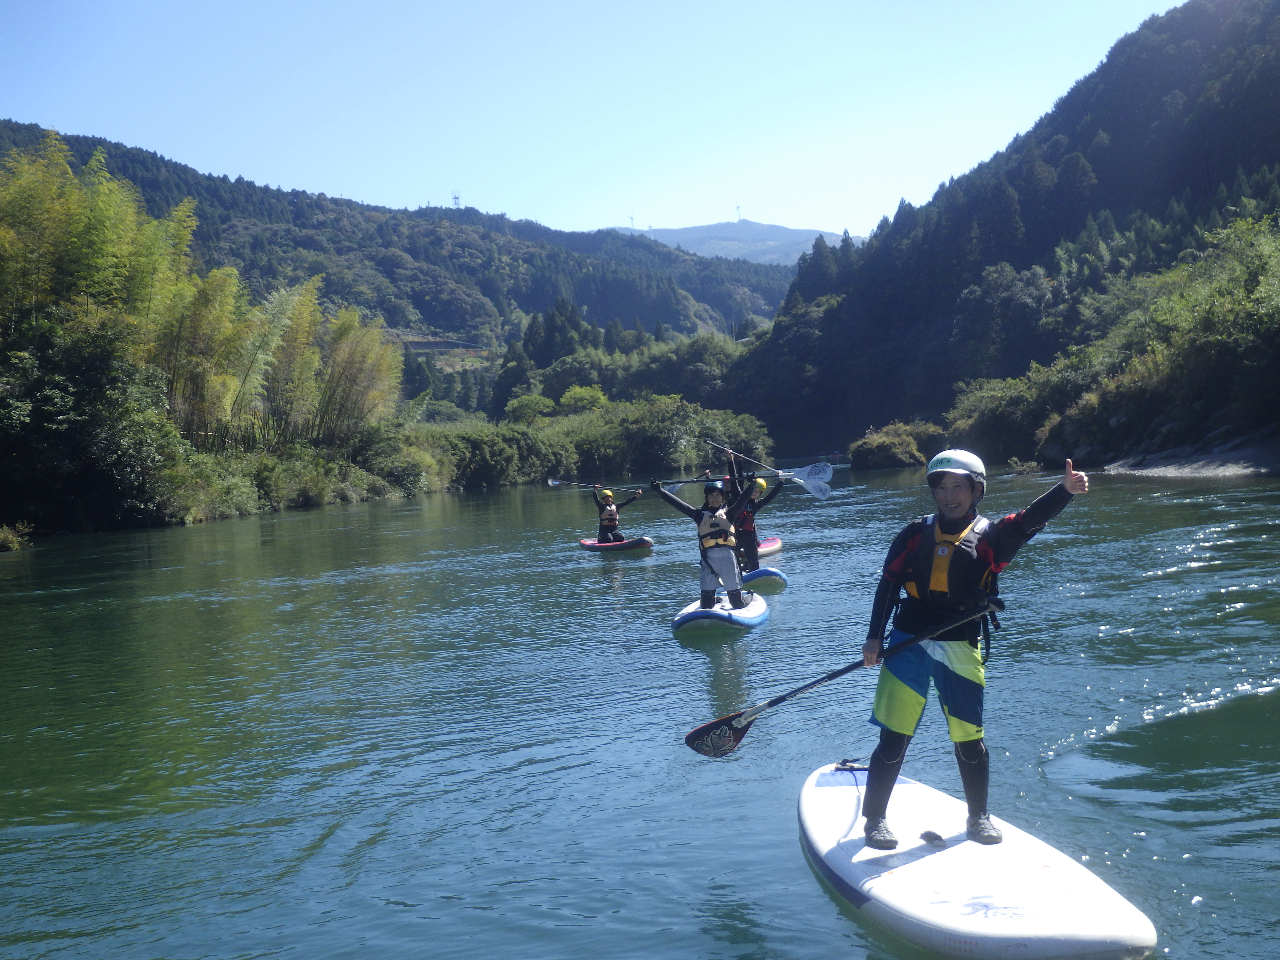 ◆SUP体験◆誰でも気軽に川や海を楽しめます!<半日静水コース>お子様と乗ったり...